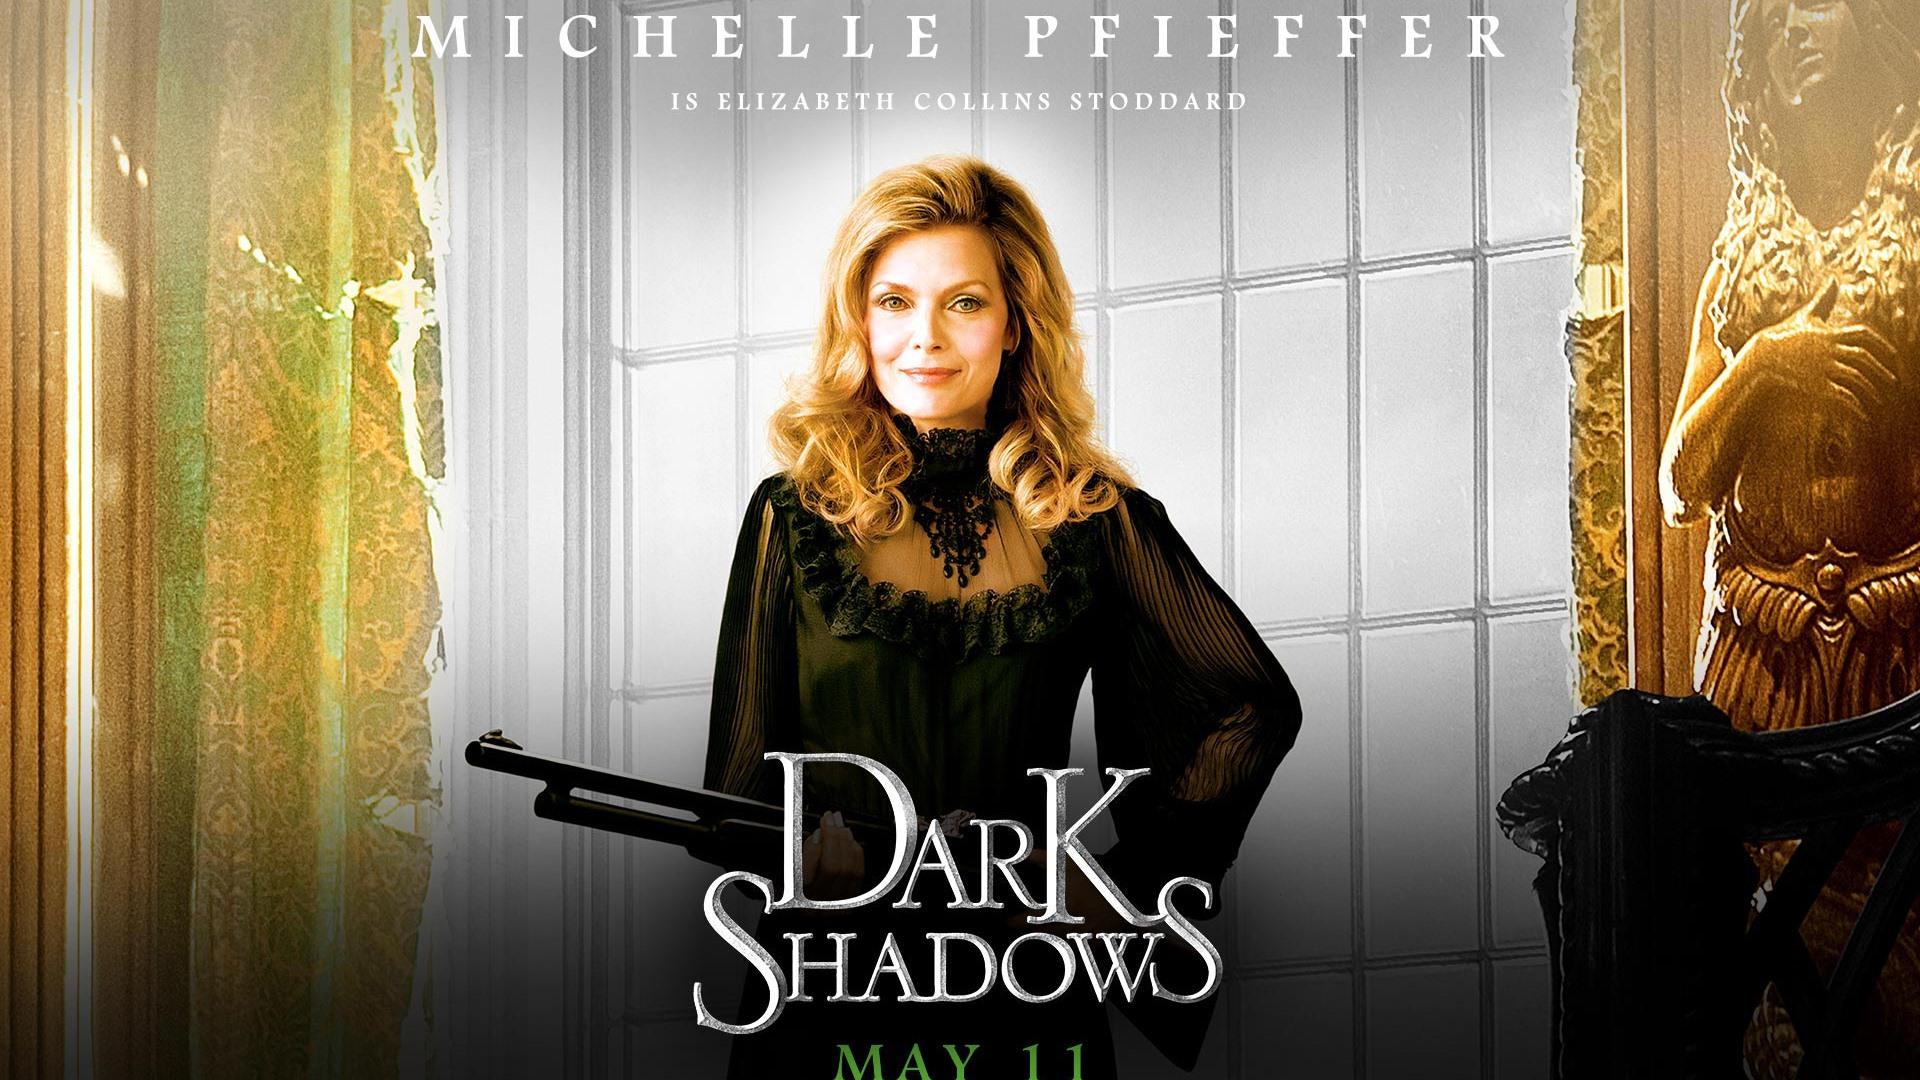 Dark Shadows Wallpapers HD movie wallpapers 12 HD Desktop 1920x1080